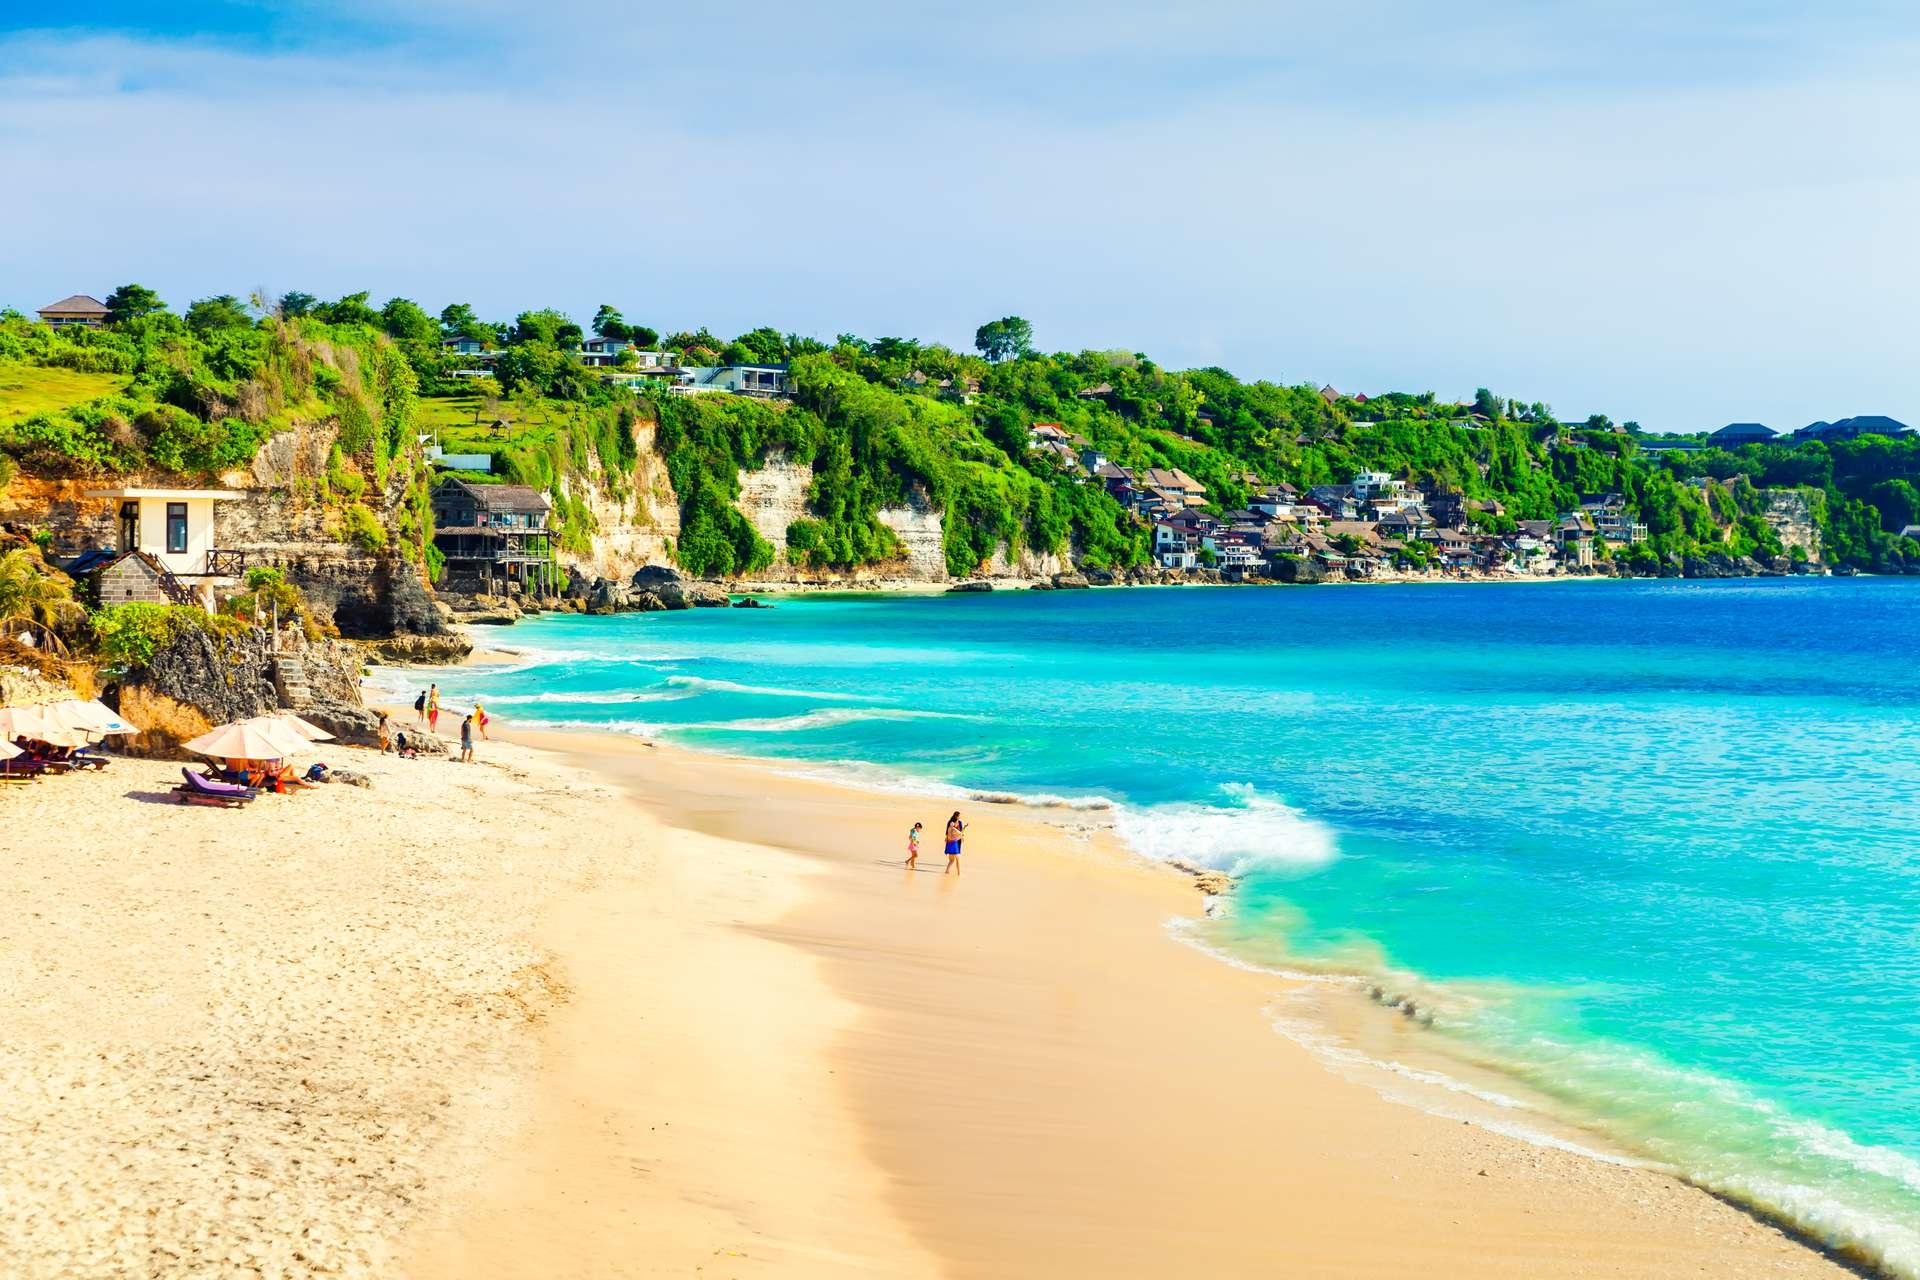 Indonesië Bali wit strand met blauwe zee